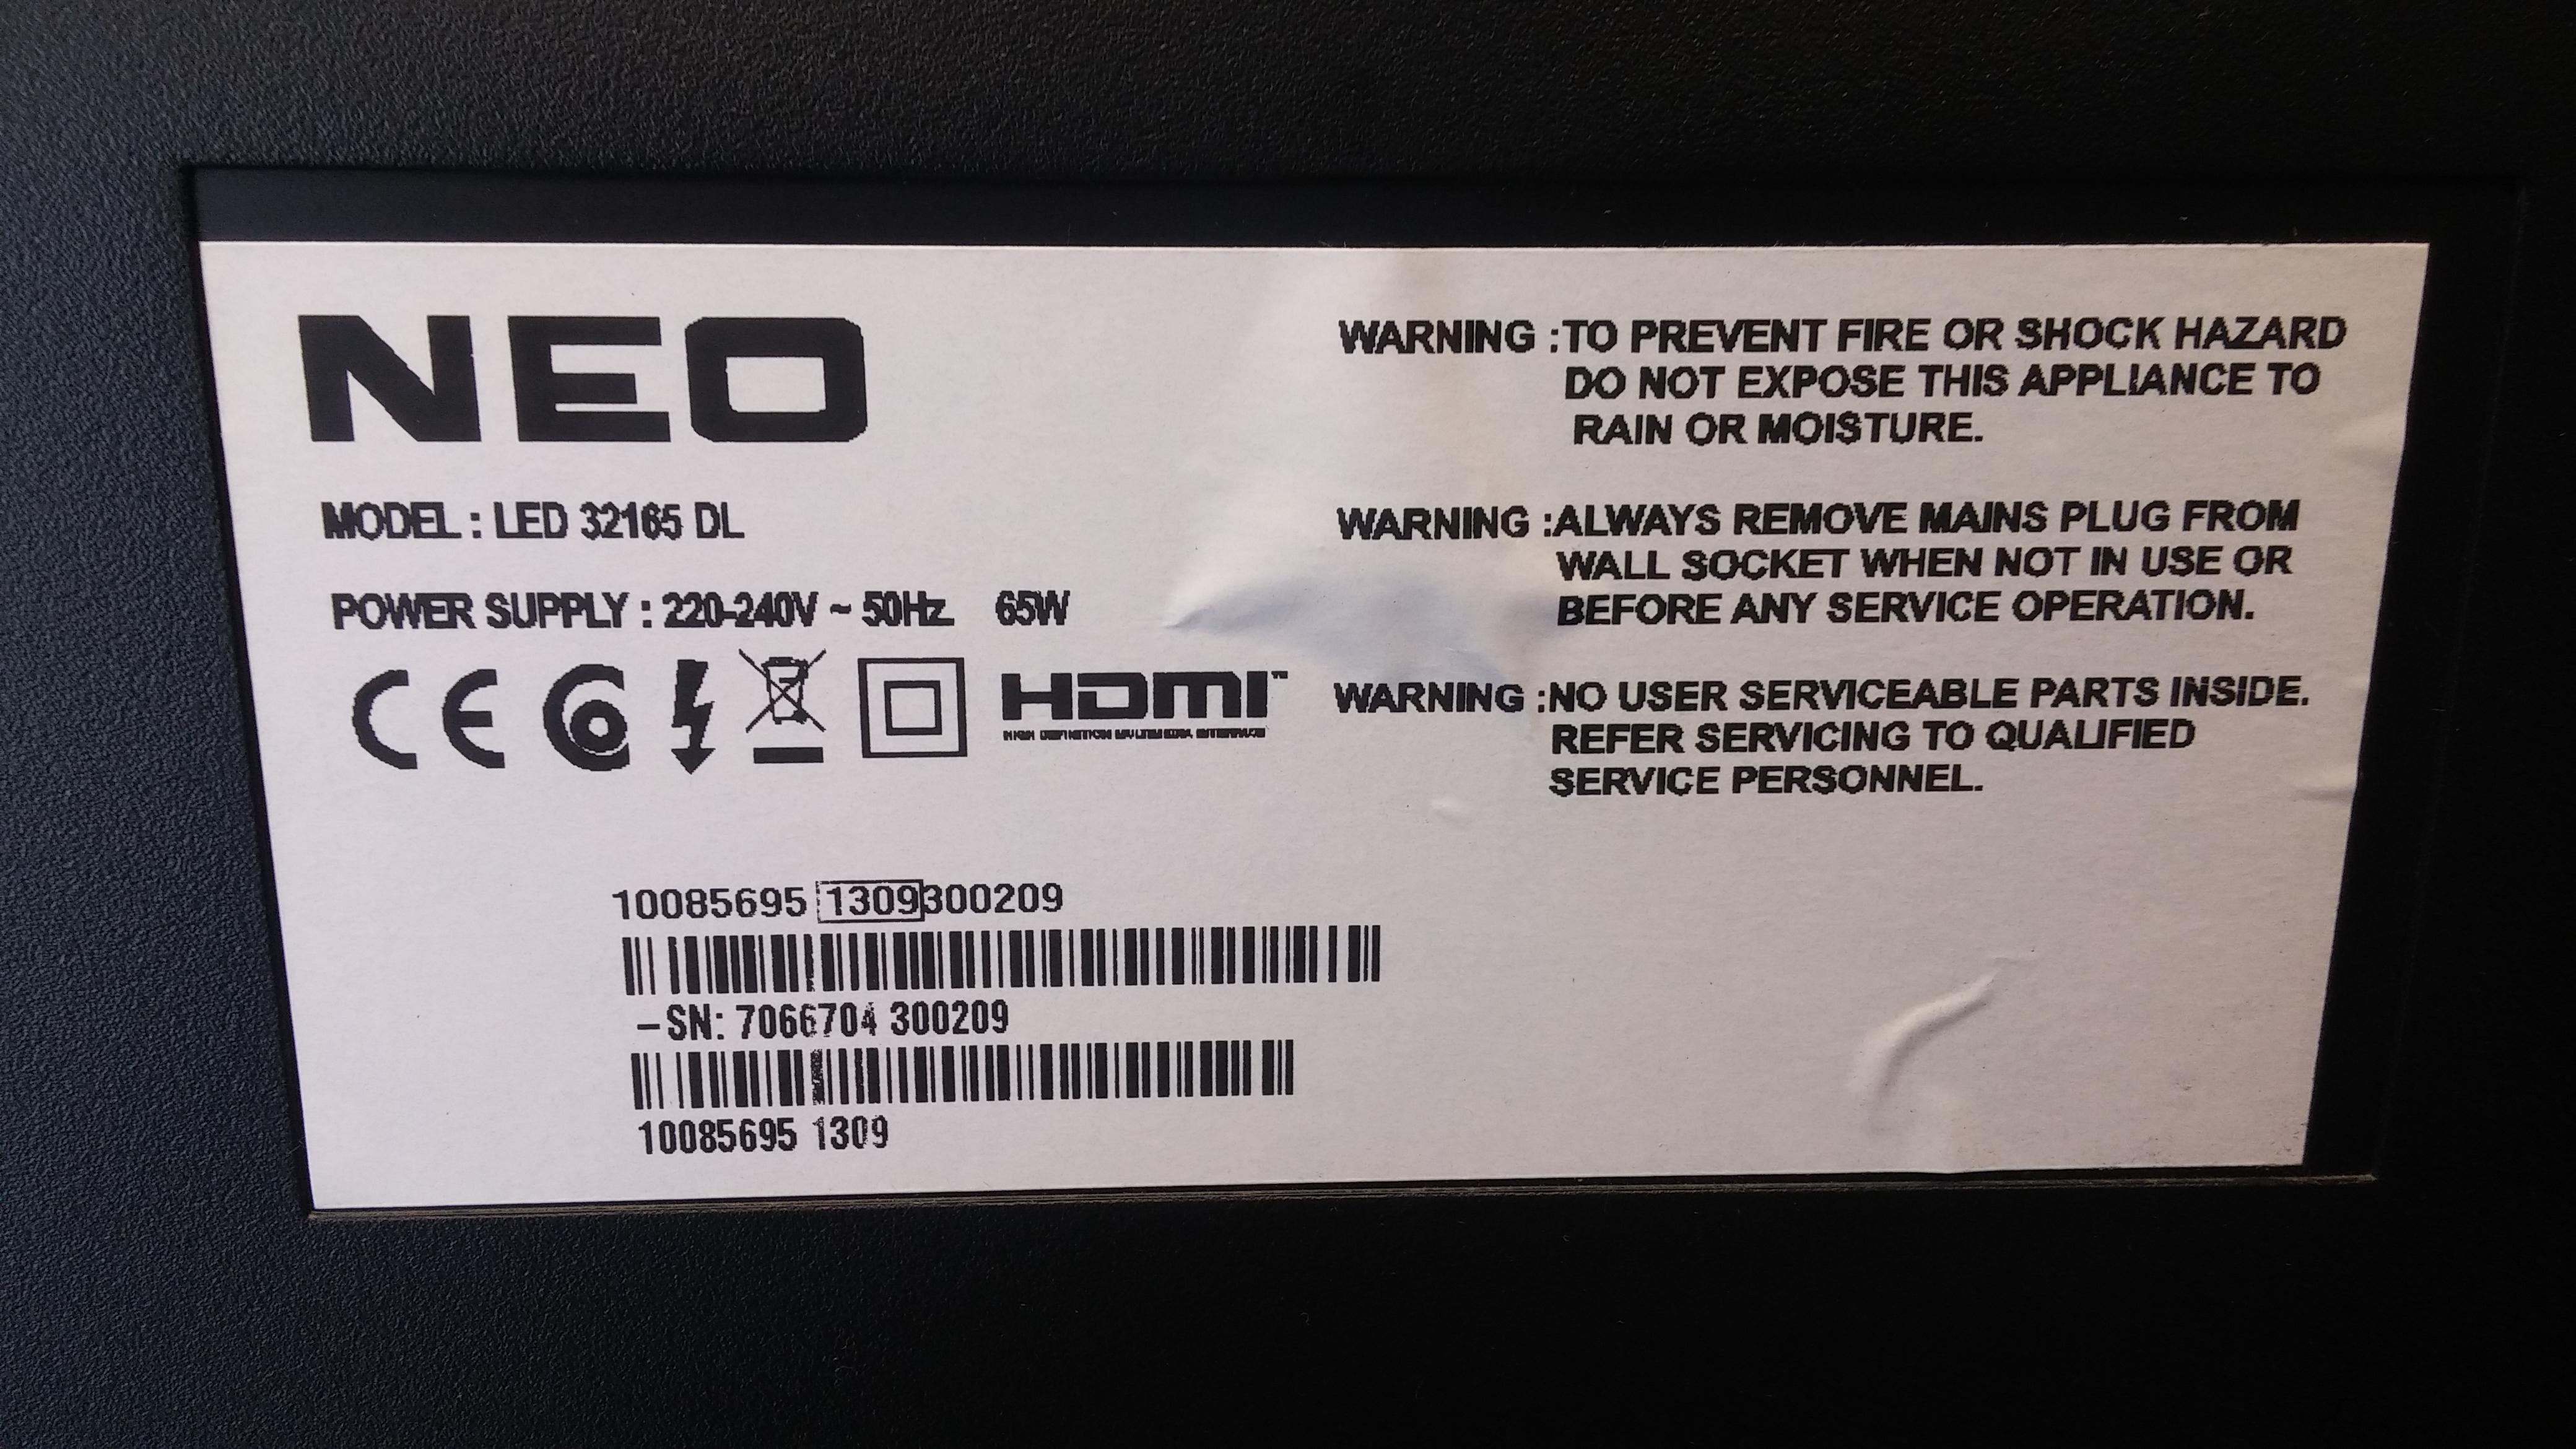 Neo LED 32165 DL, 17MB82-2, VES315WNDA-01 - CiklonElectro